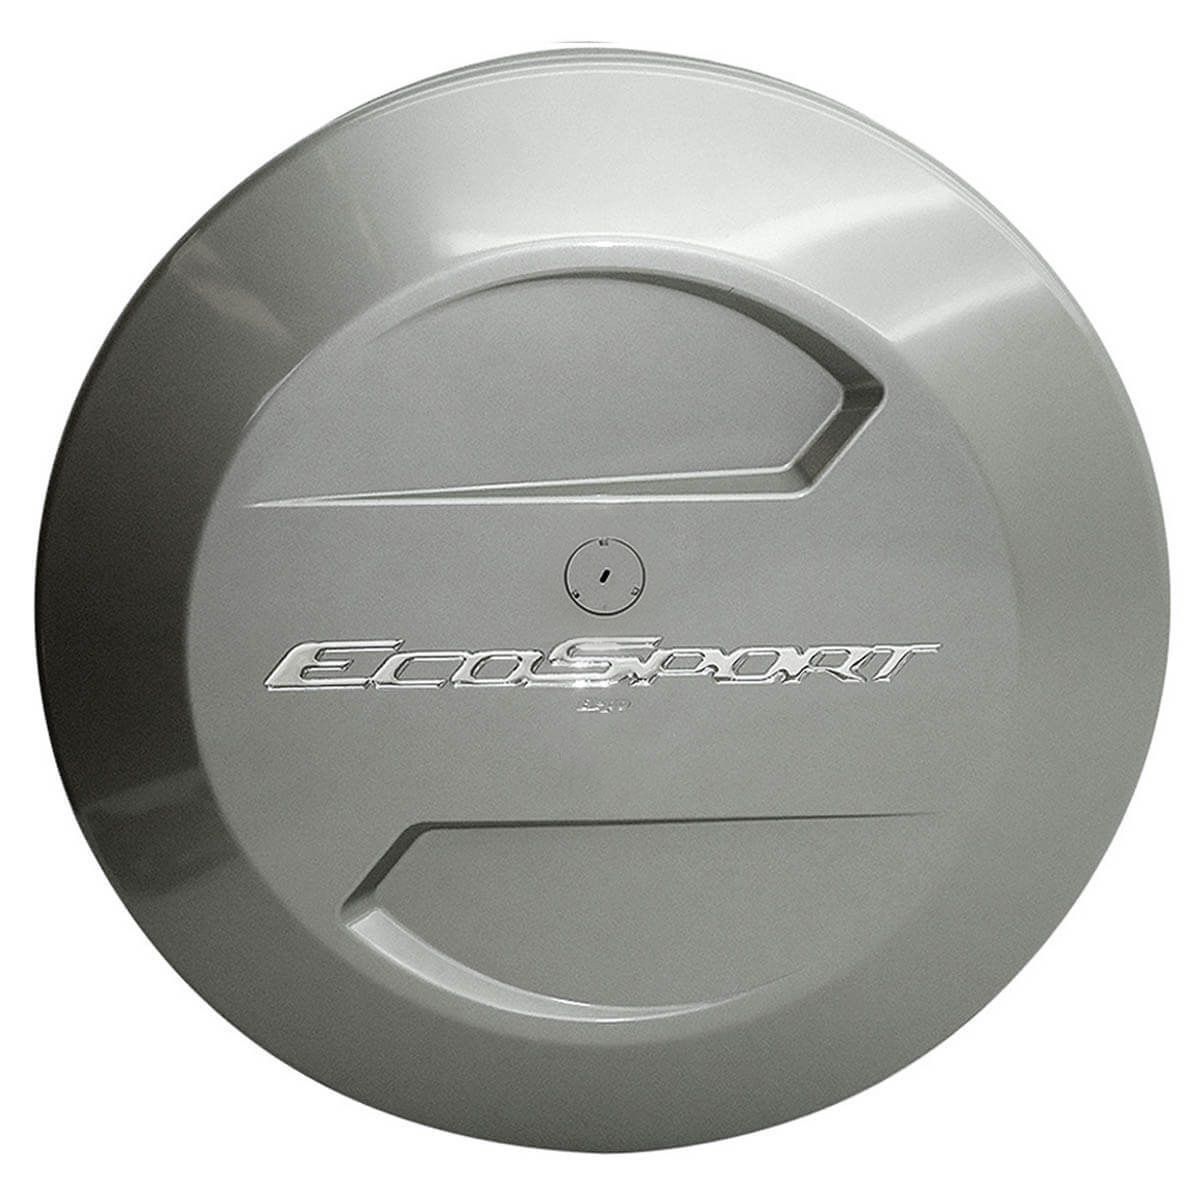 Capa de estepe Bepo rígida Ecosport 2010 a 2017 cor Prata Riviera